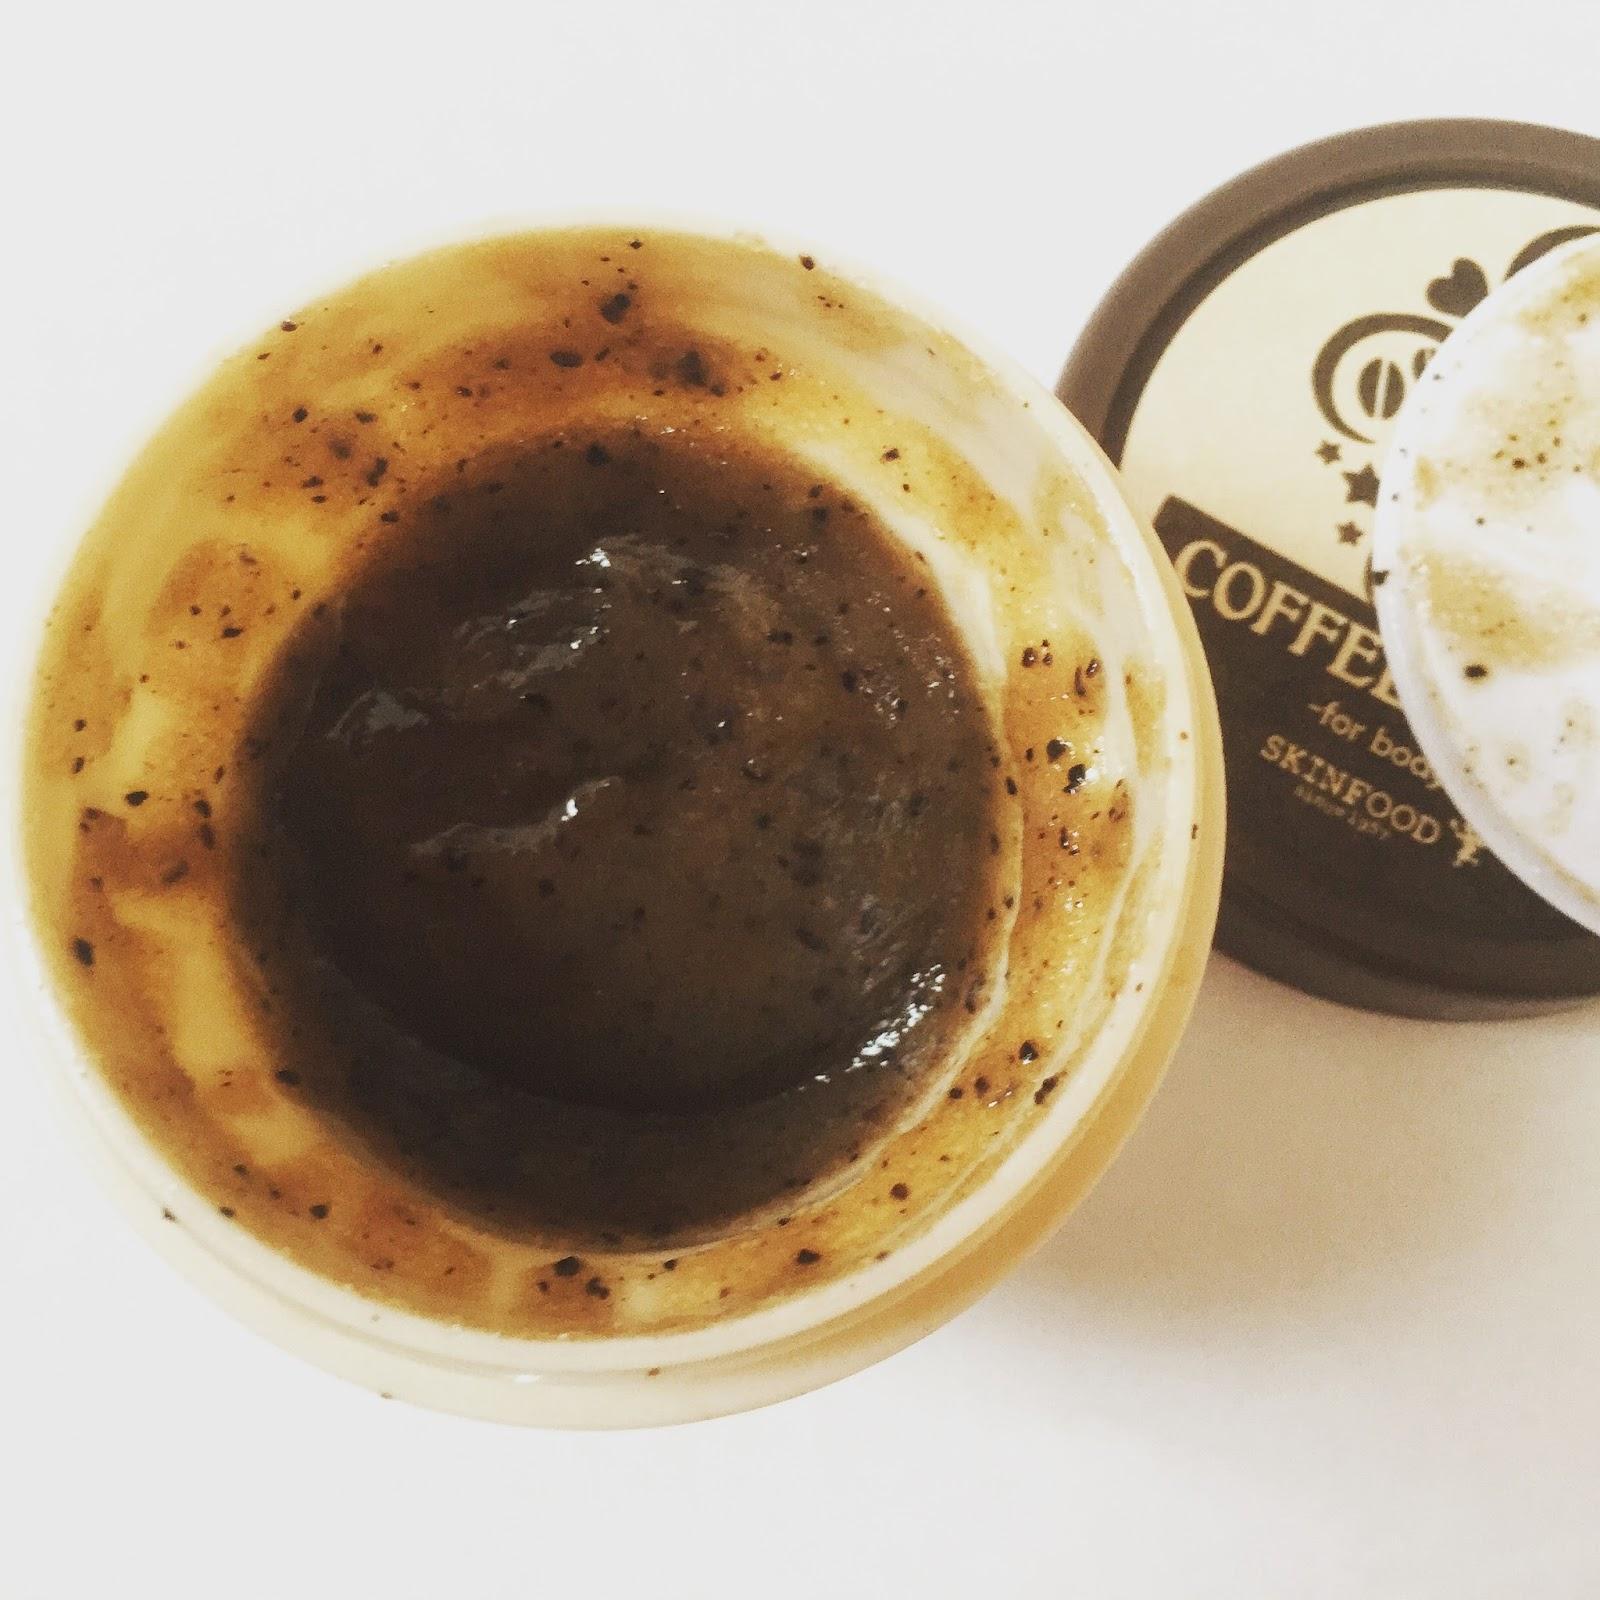 SKINFOOD COFFEE SCRUB